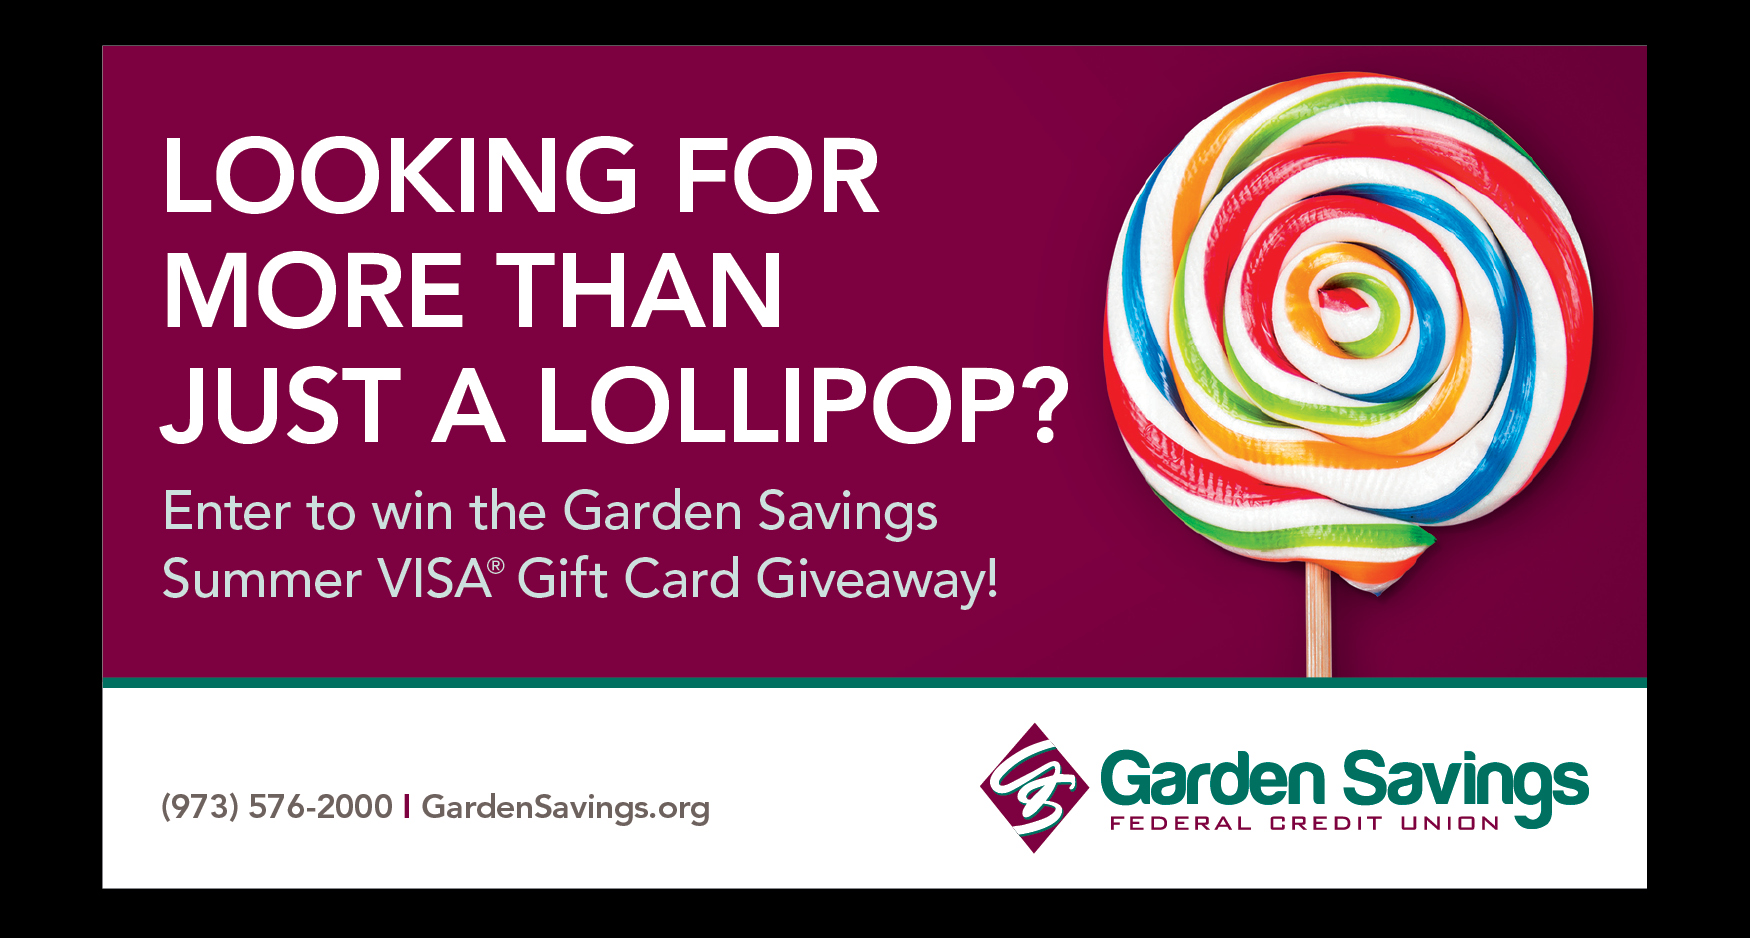 GSFCU Card 1 - GARDEN SAVINGS - VISA GIVEAWAY PROMOTION